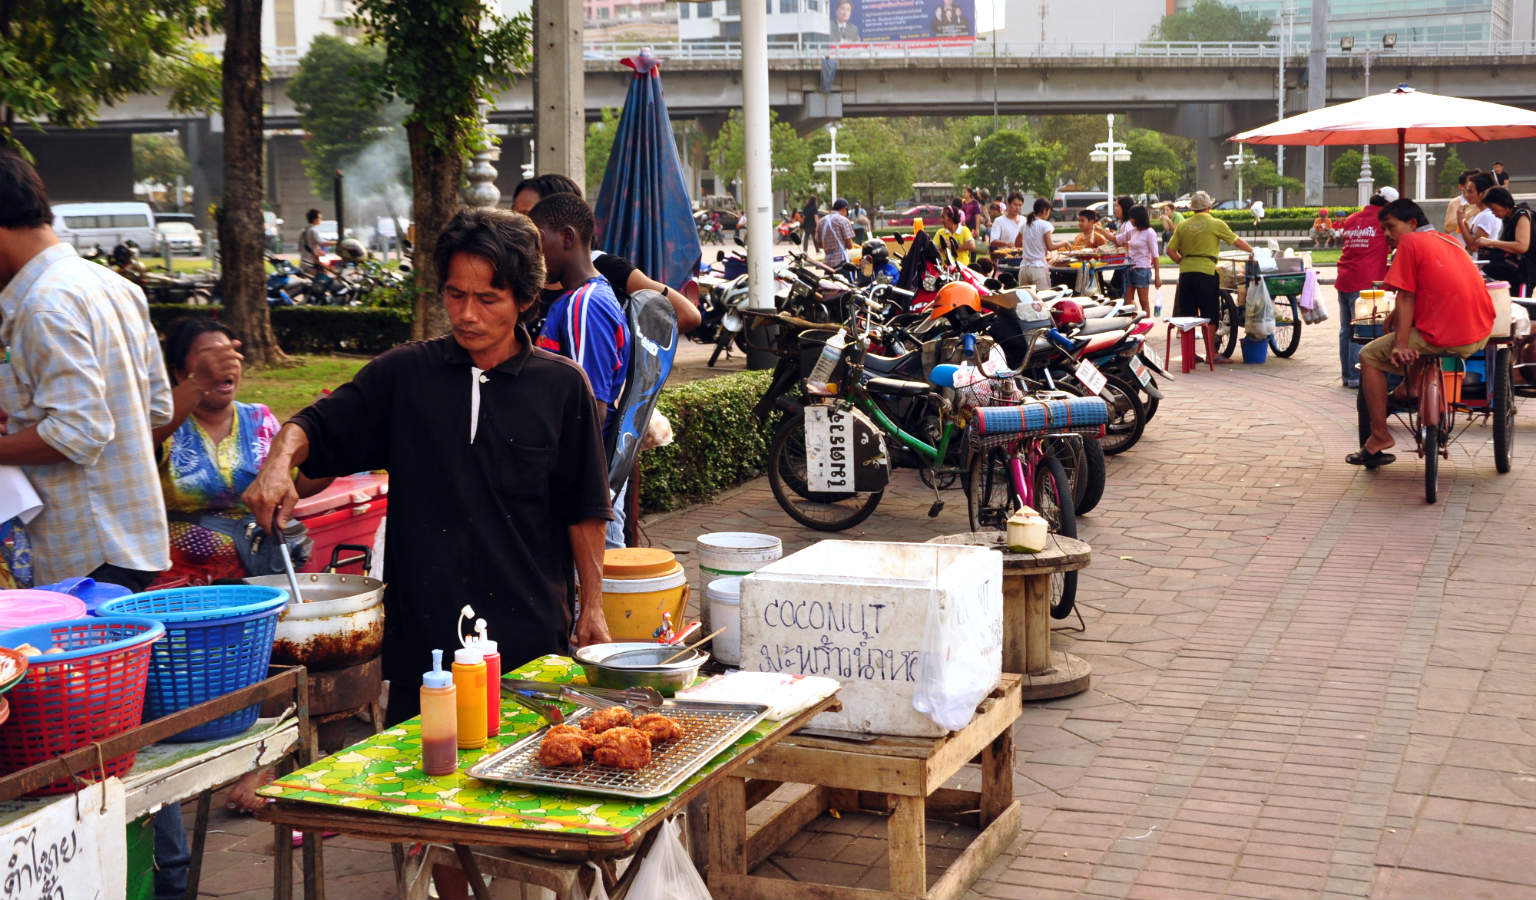 Food stalls bij de ingang van Lumphini Park in Bangkok, Thailand